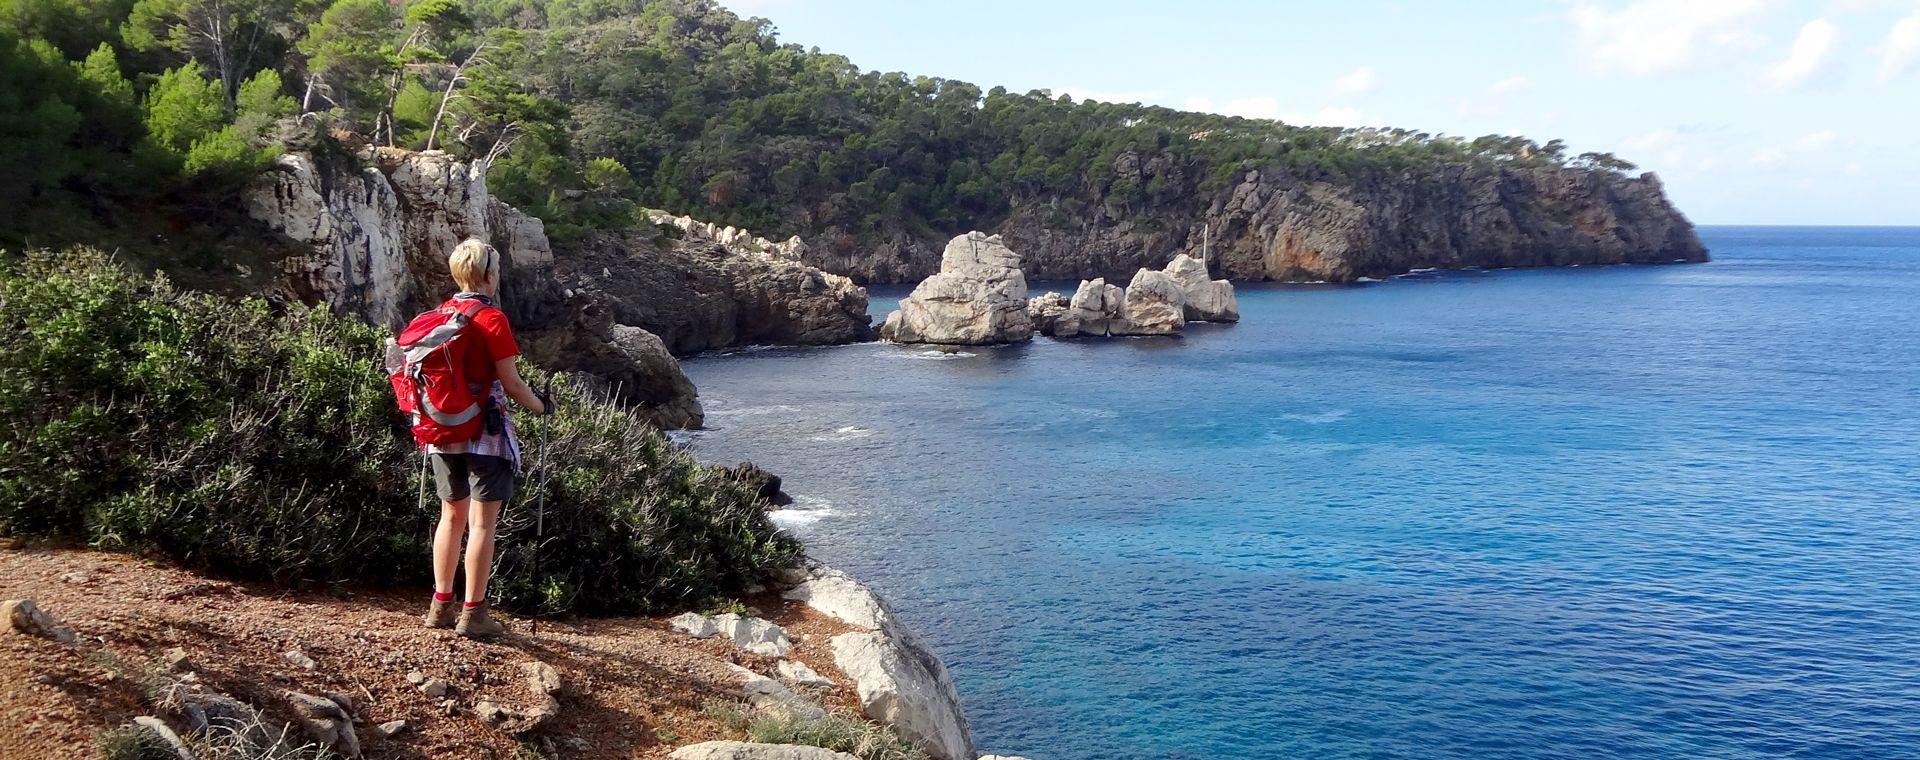 Voyage à pied : Le charme de Majorque en \